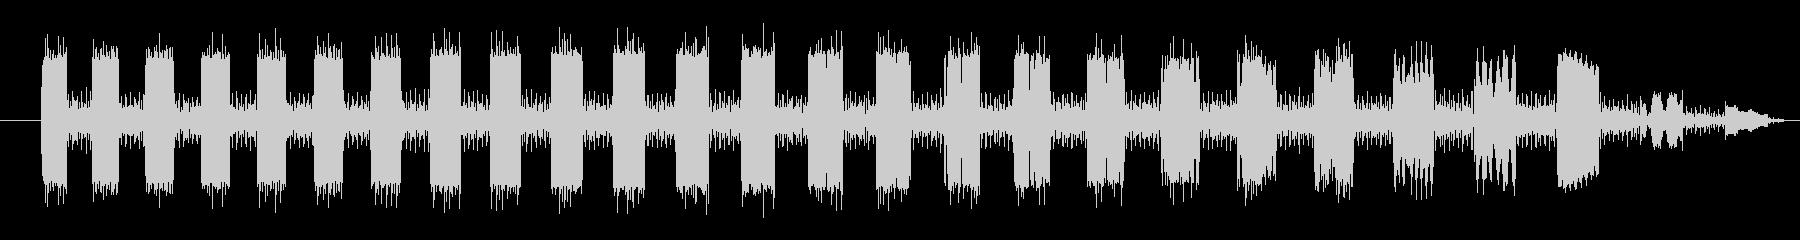 FX 作業ロボット03の未再生の波形